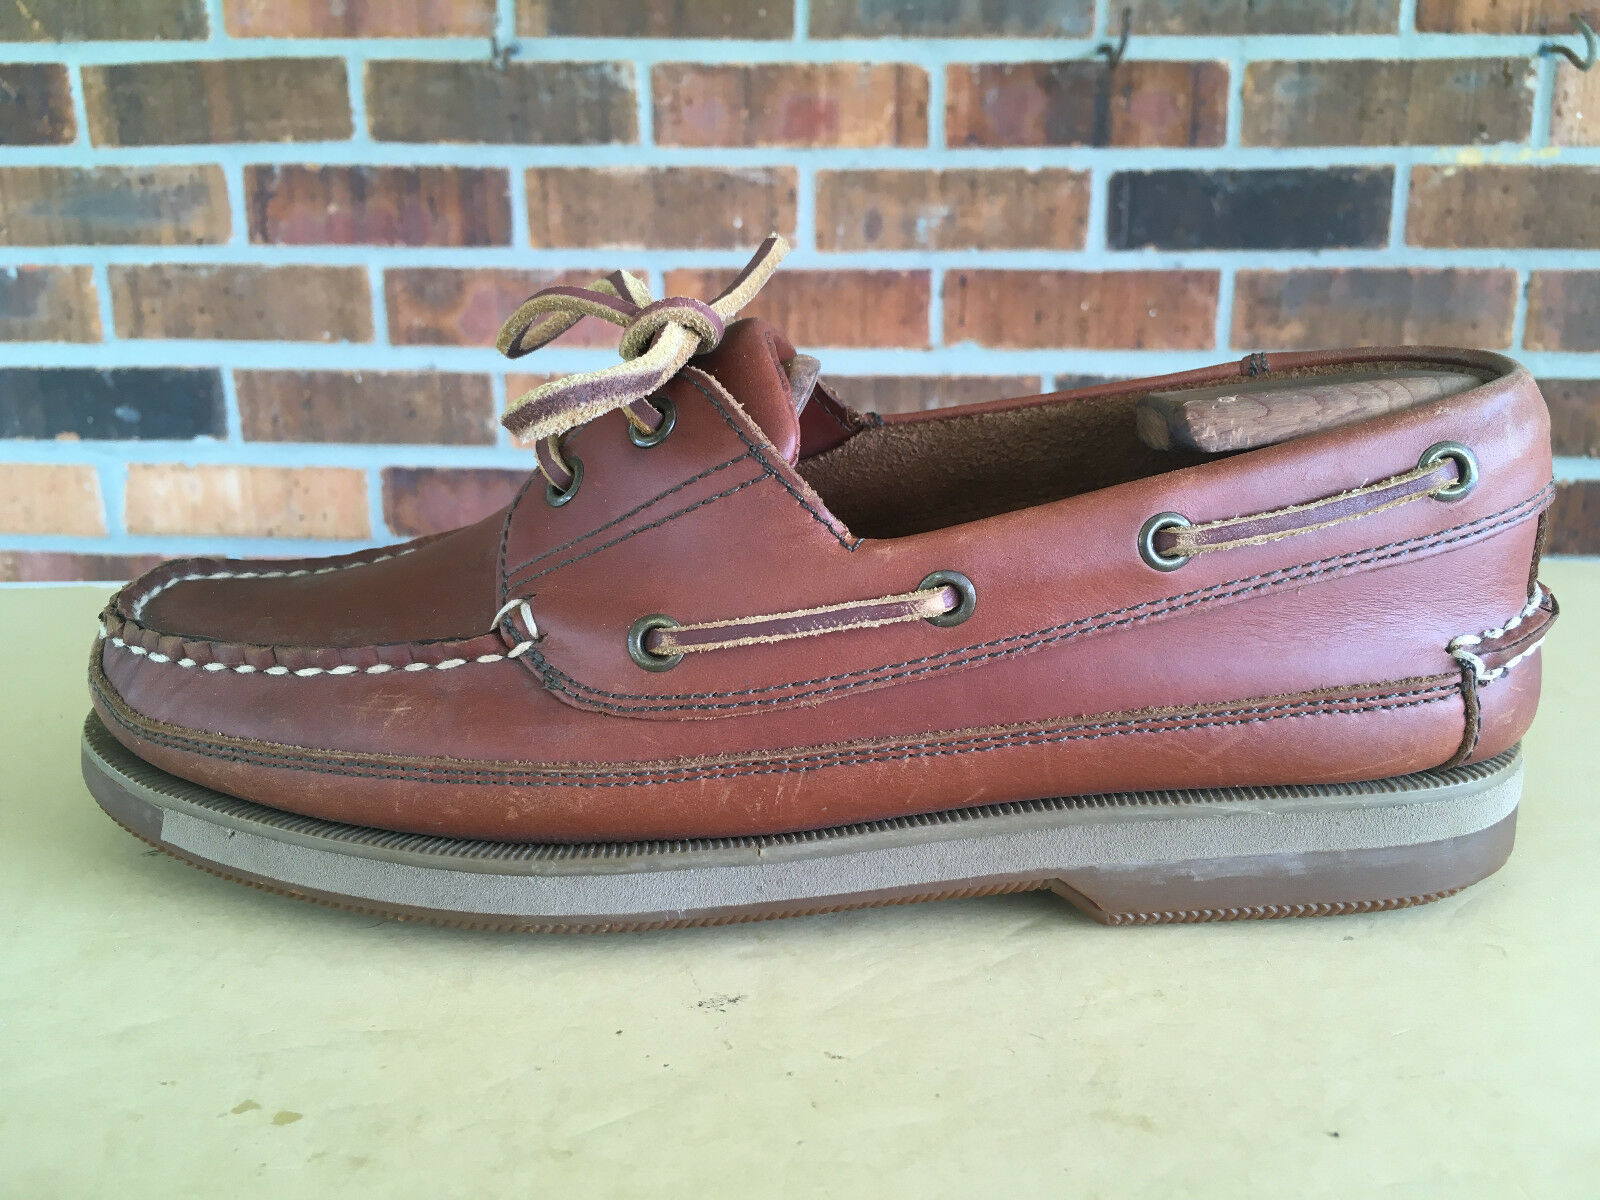 West Marine Comfort Classic Moc  Leather Boat Shoes Brown  Moc Men's Size 8.5G  36(10 4ebb36